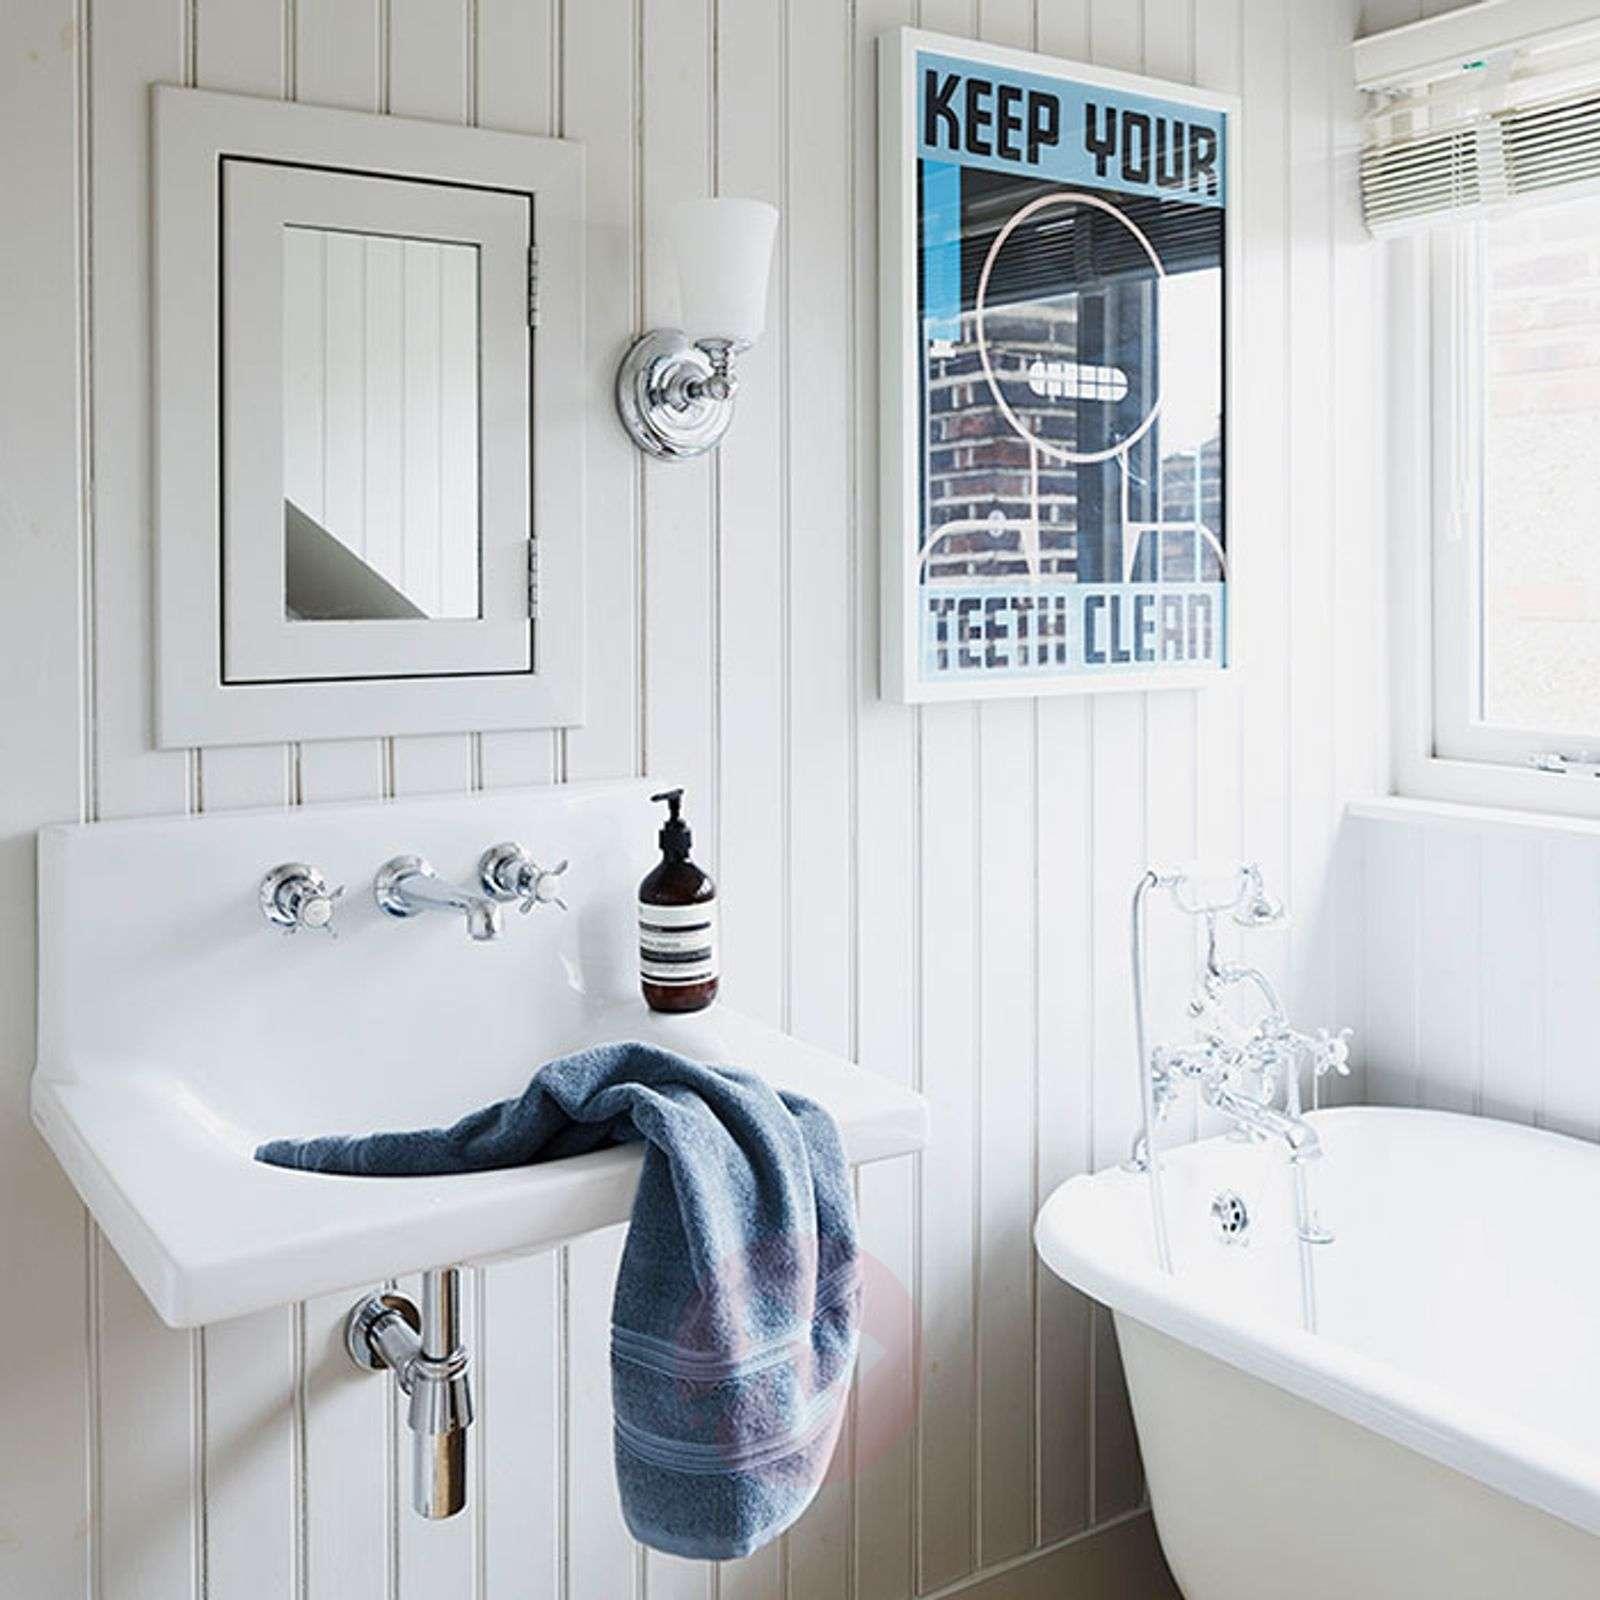 Fascinating bathroom wall light Huguenot Lake-3048640-02